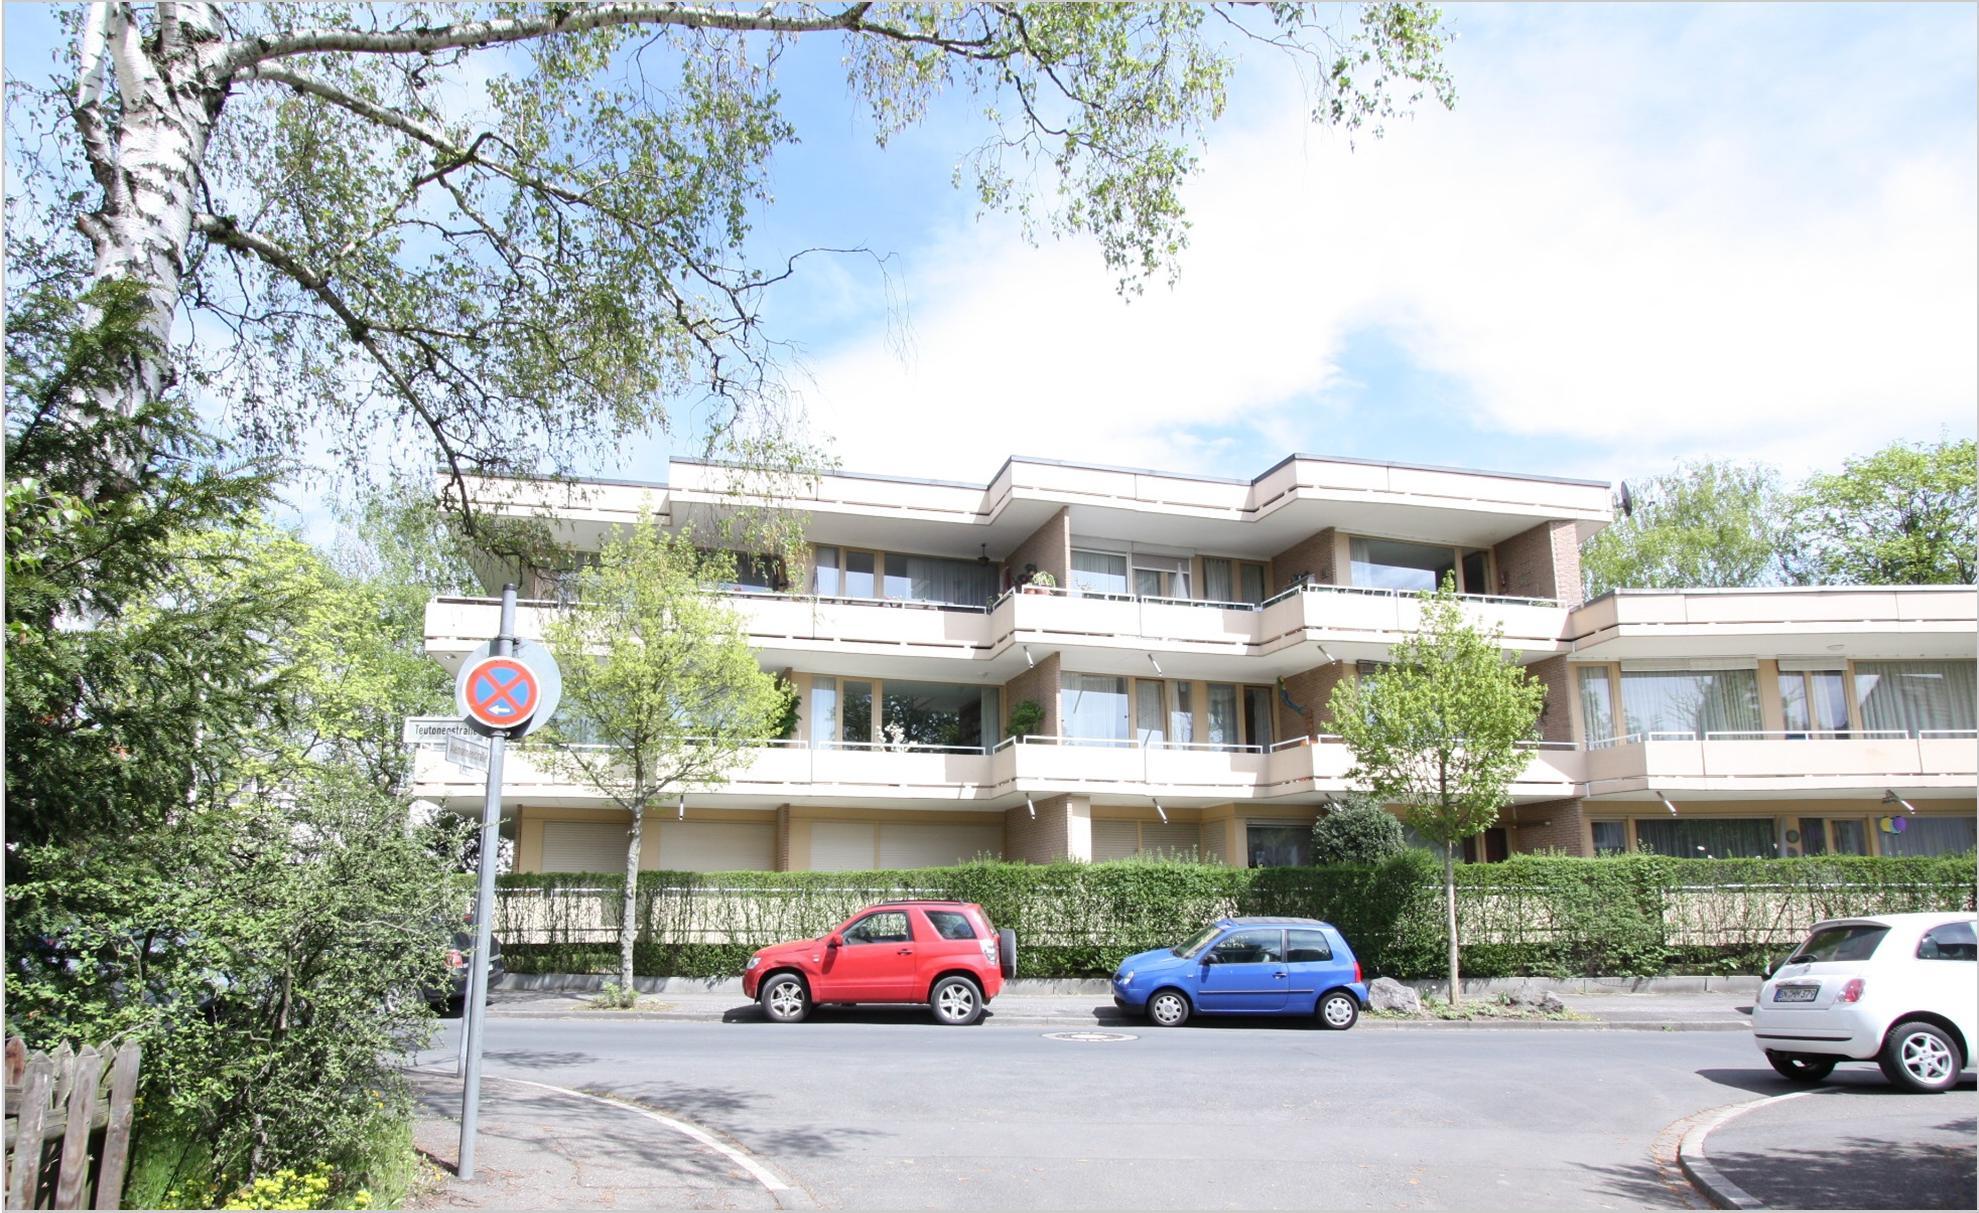 Foto: Eigentumswohnung In Bad Godesberg